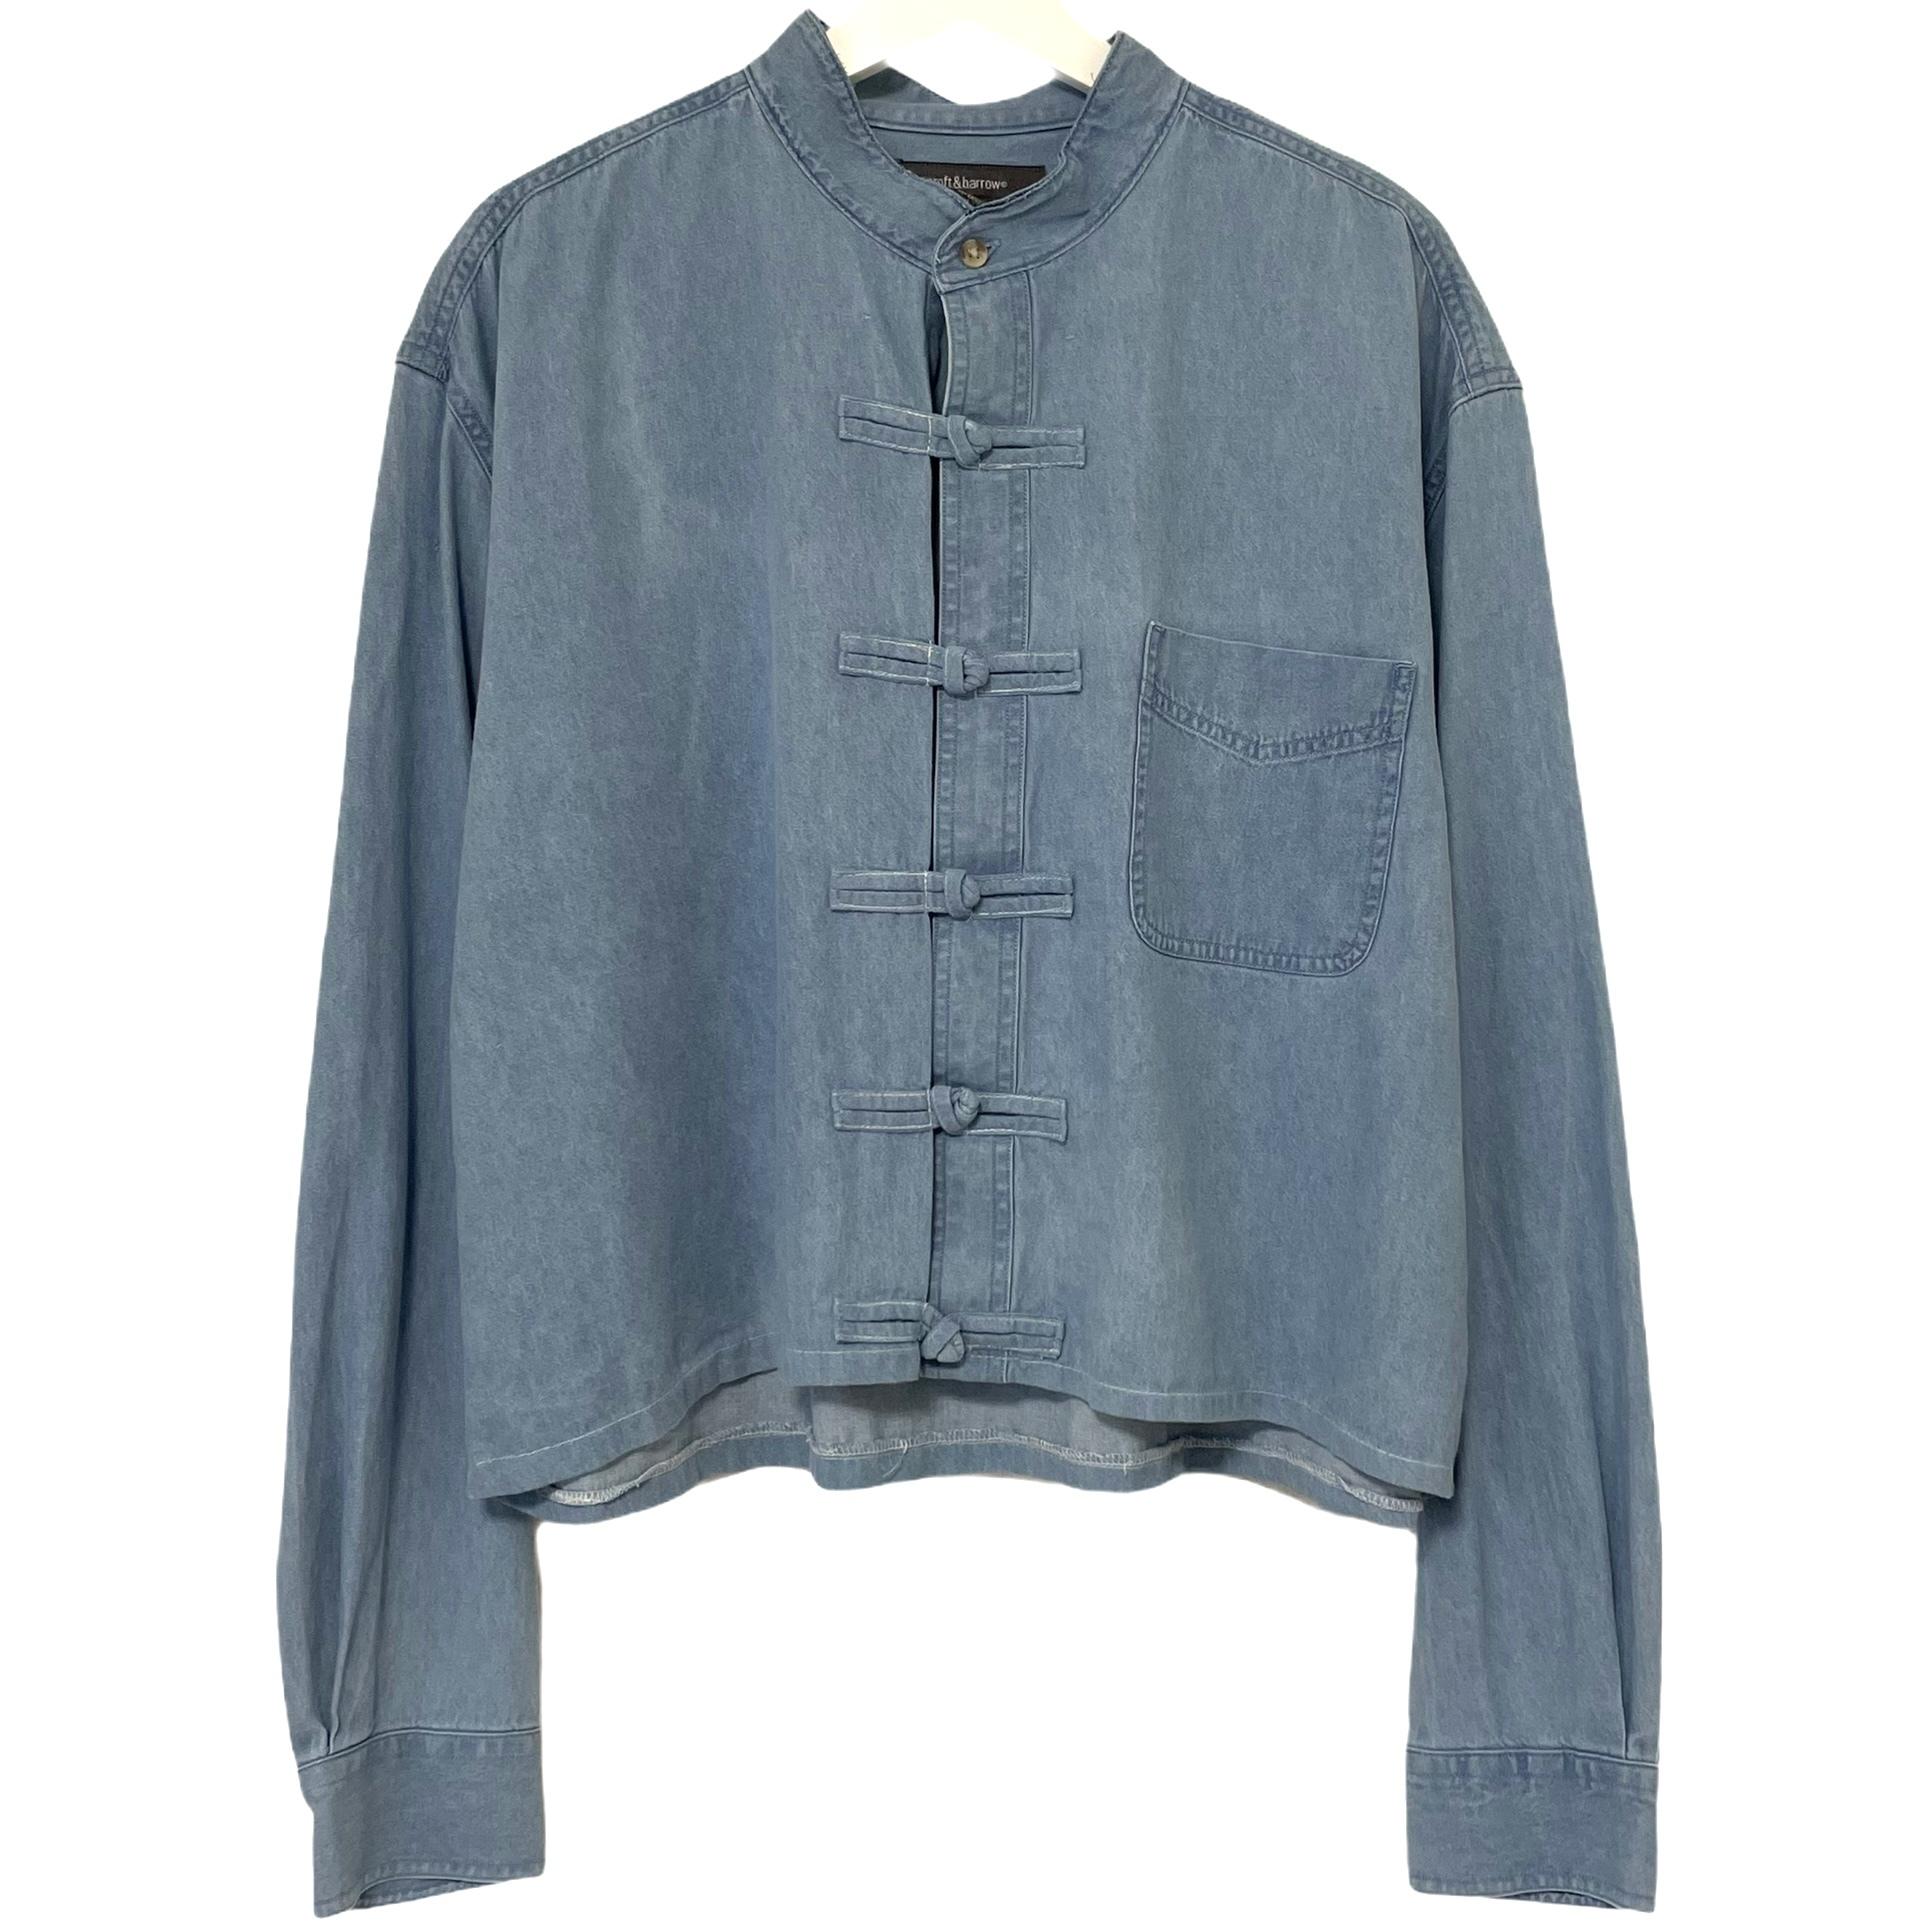 Remake China Shirt 【 Denim Light Blue Short 】